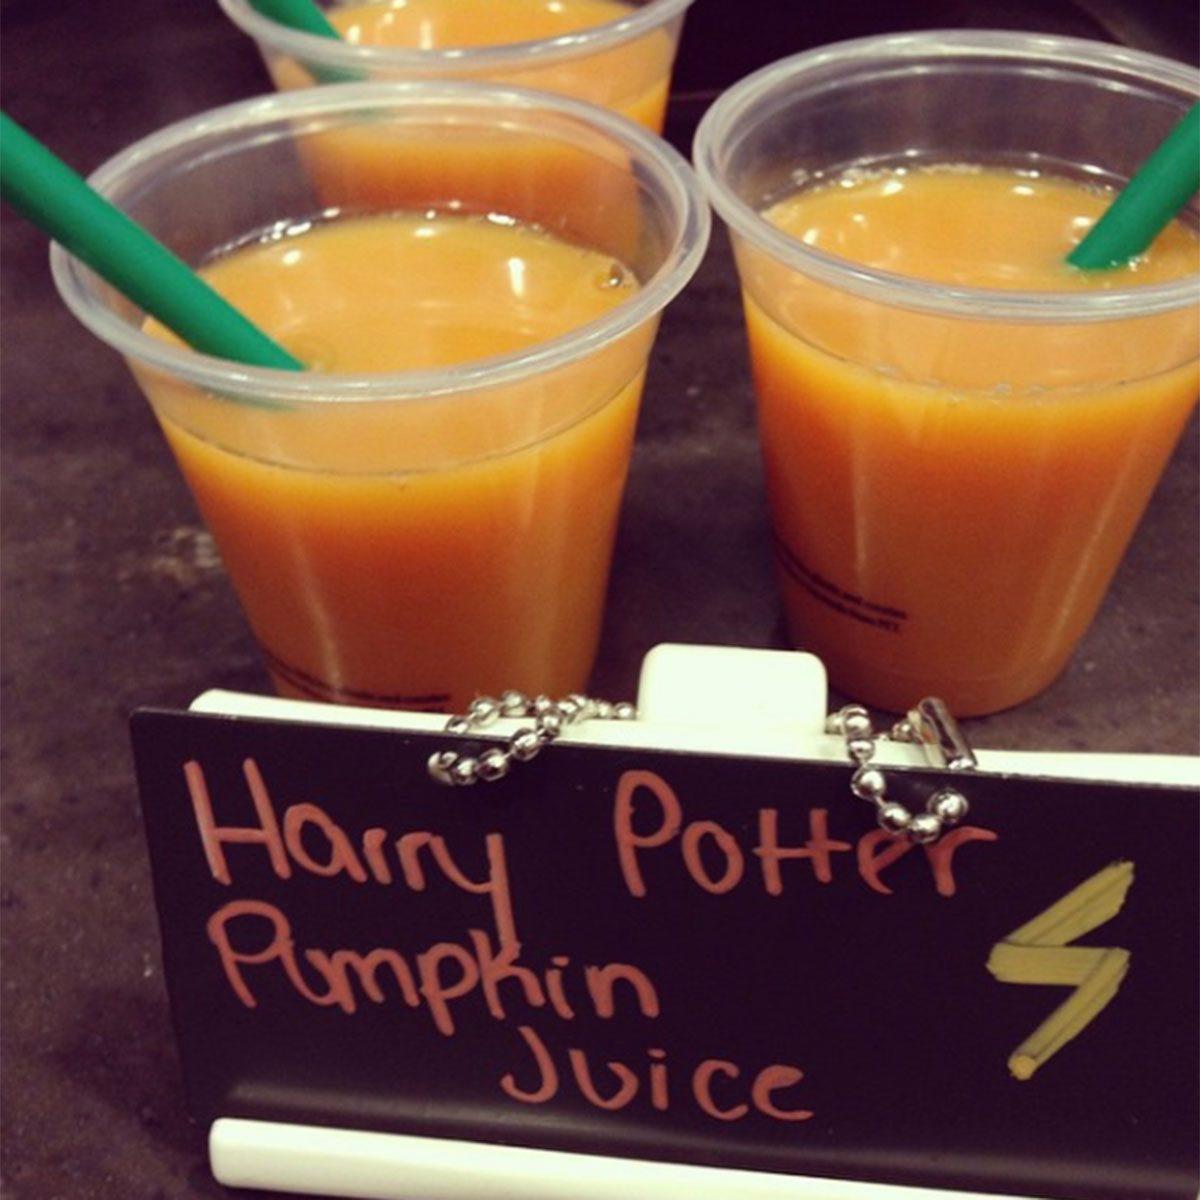 Harry Potter pumpkin juice